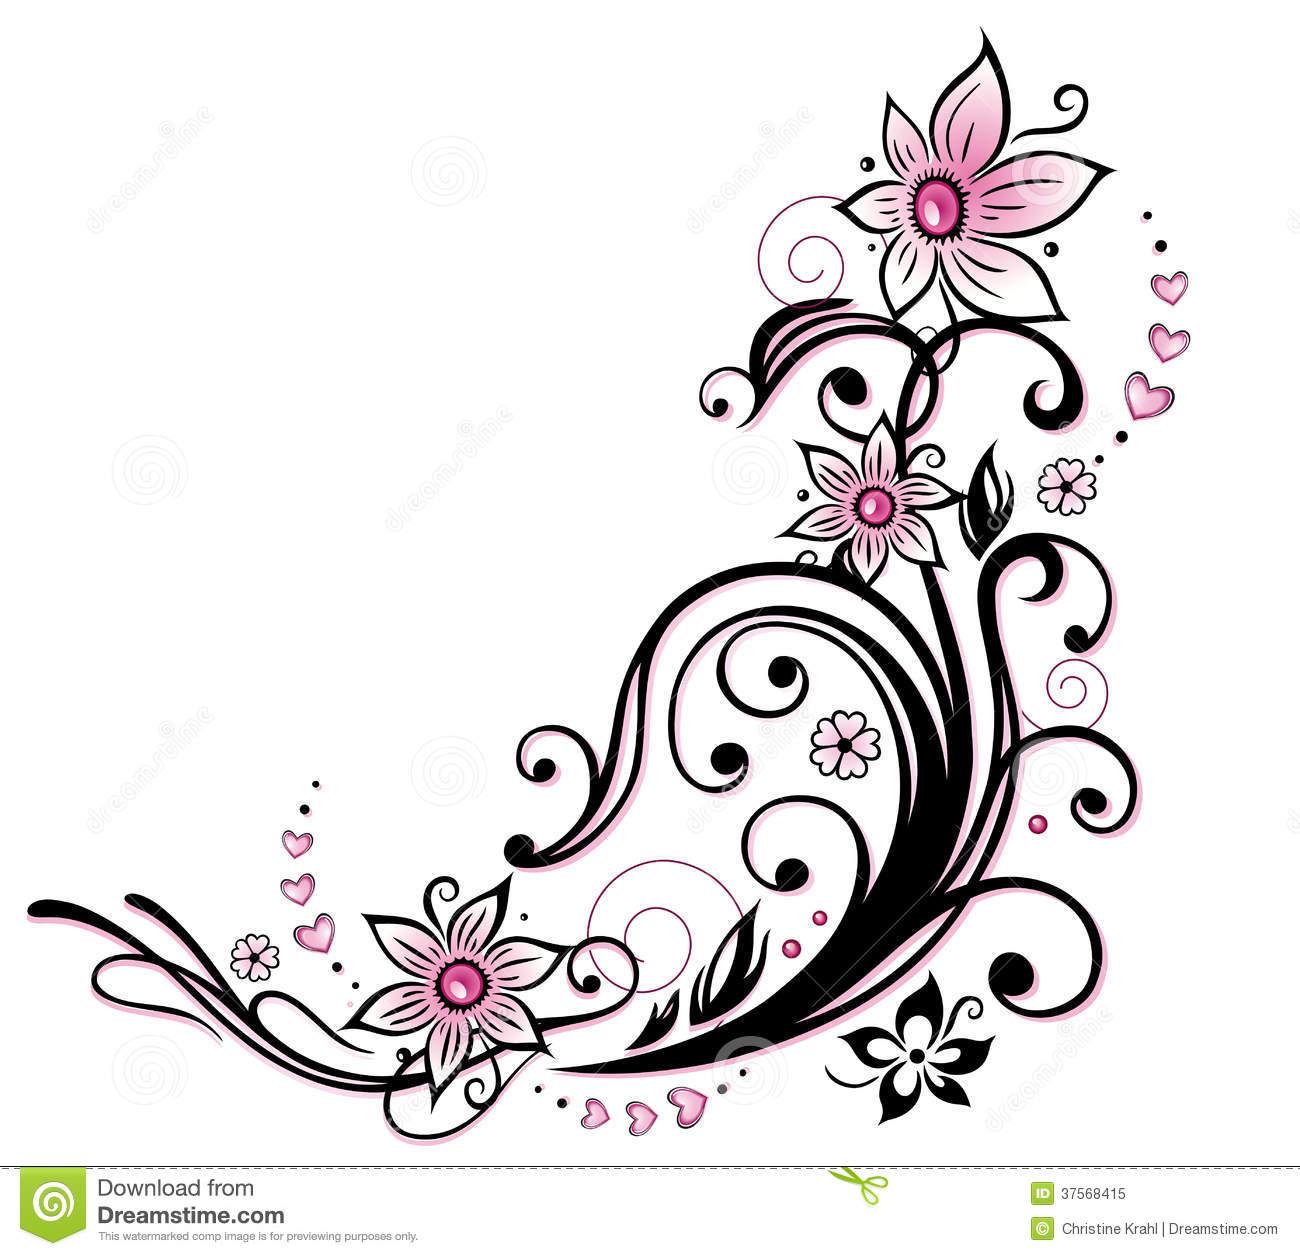 Floral clip art borders freeuse Small flower border clip art - ClipartFest freeuse